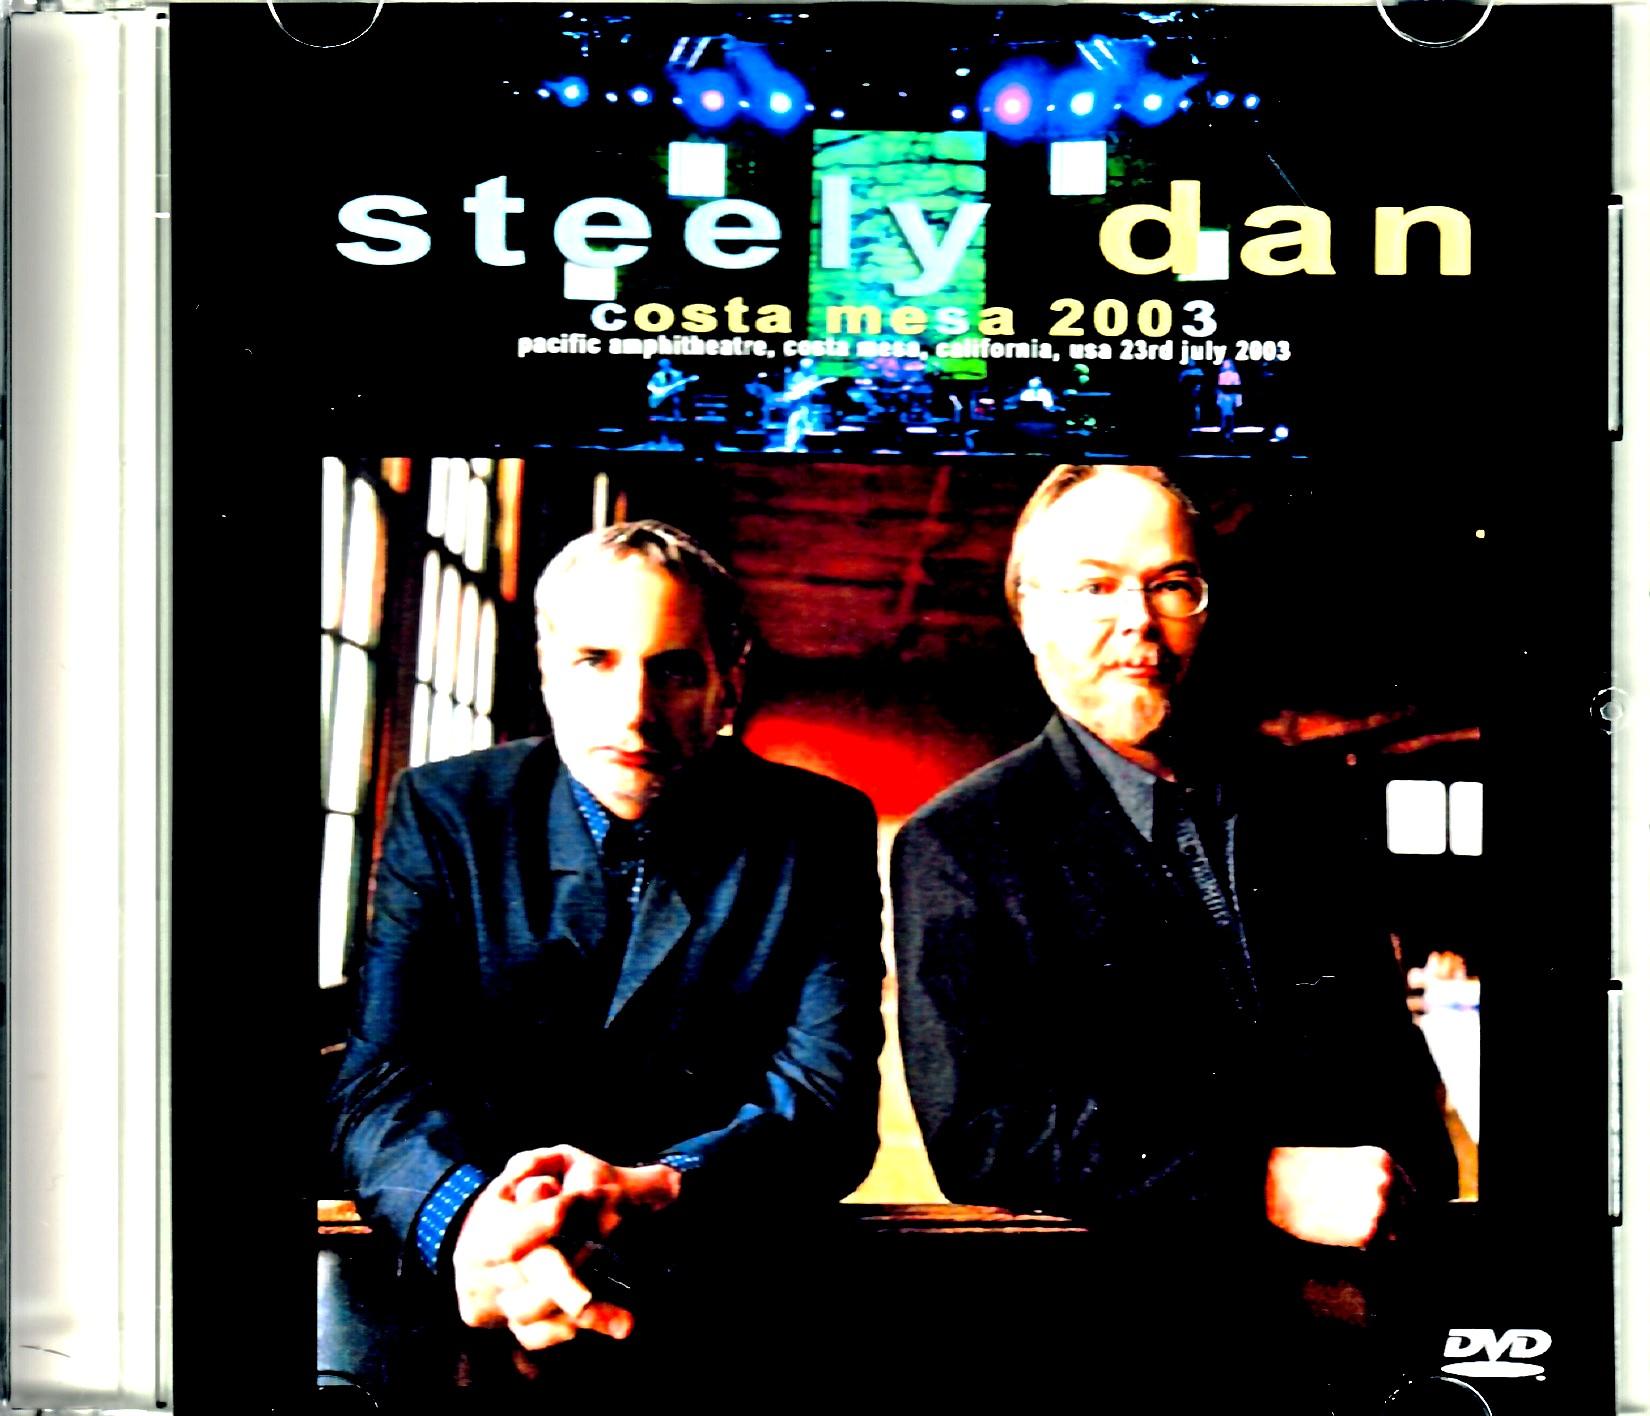 Steely Dan スティーリー・ダン/CA,USA 2003 Complete